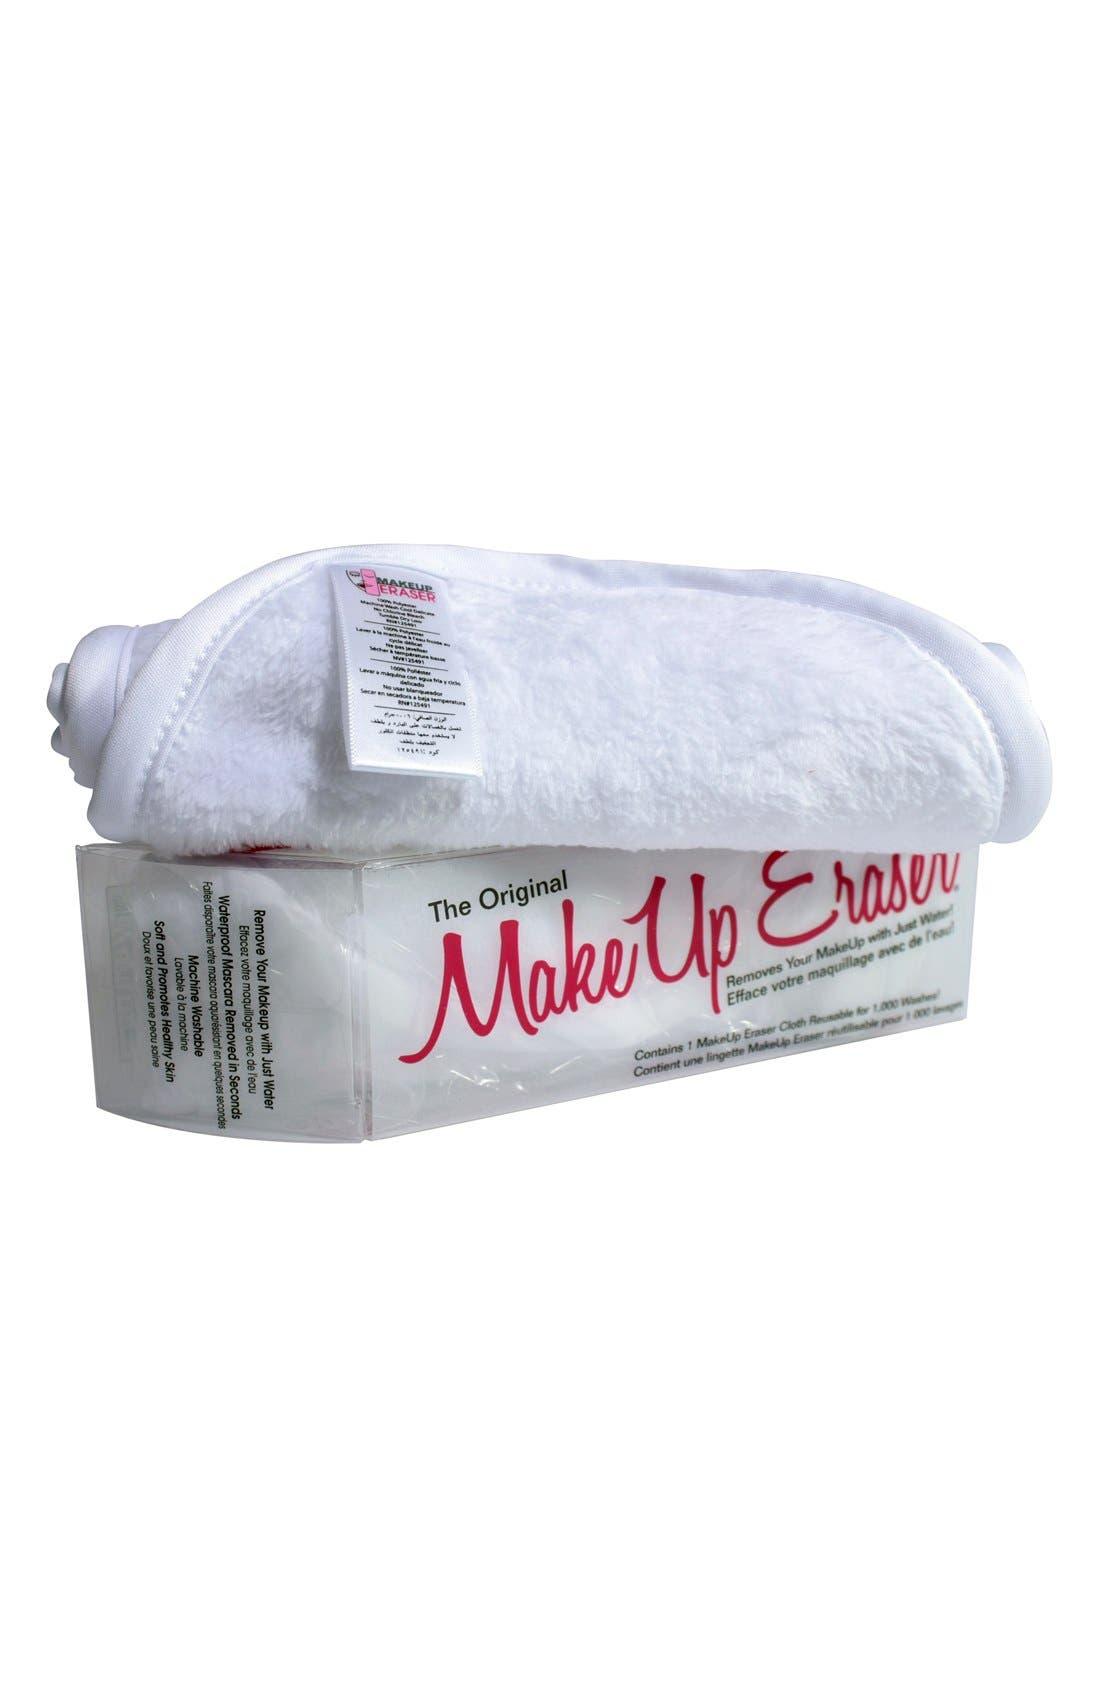 Image of The Original MakeUp Eraser Clean White MakeUp Eraser